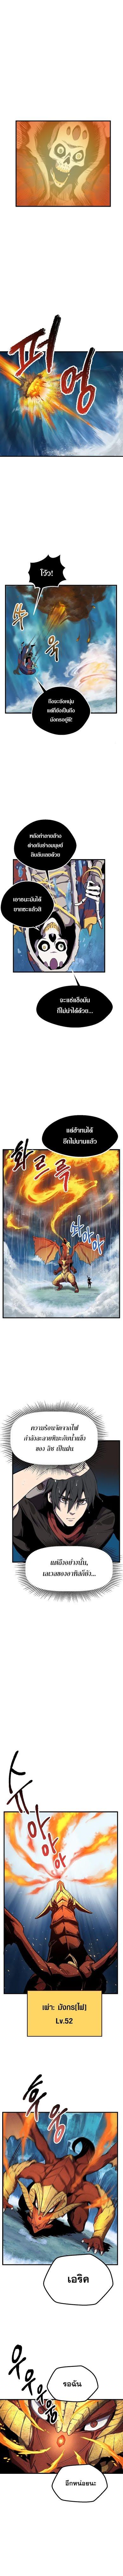 Survival of Blade King - หน้า 3